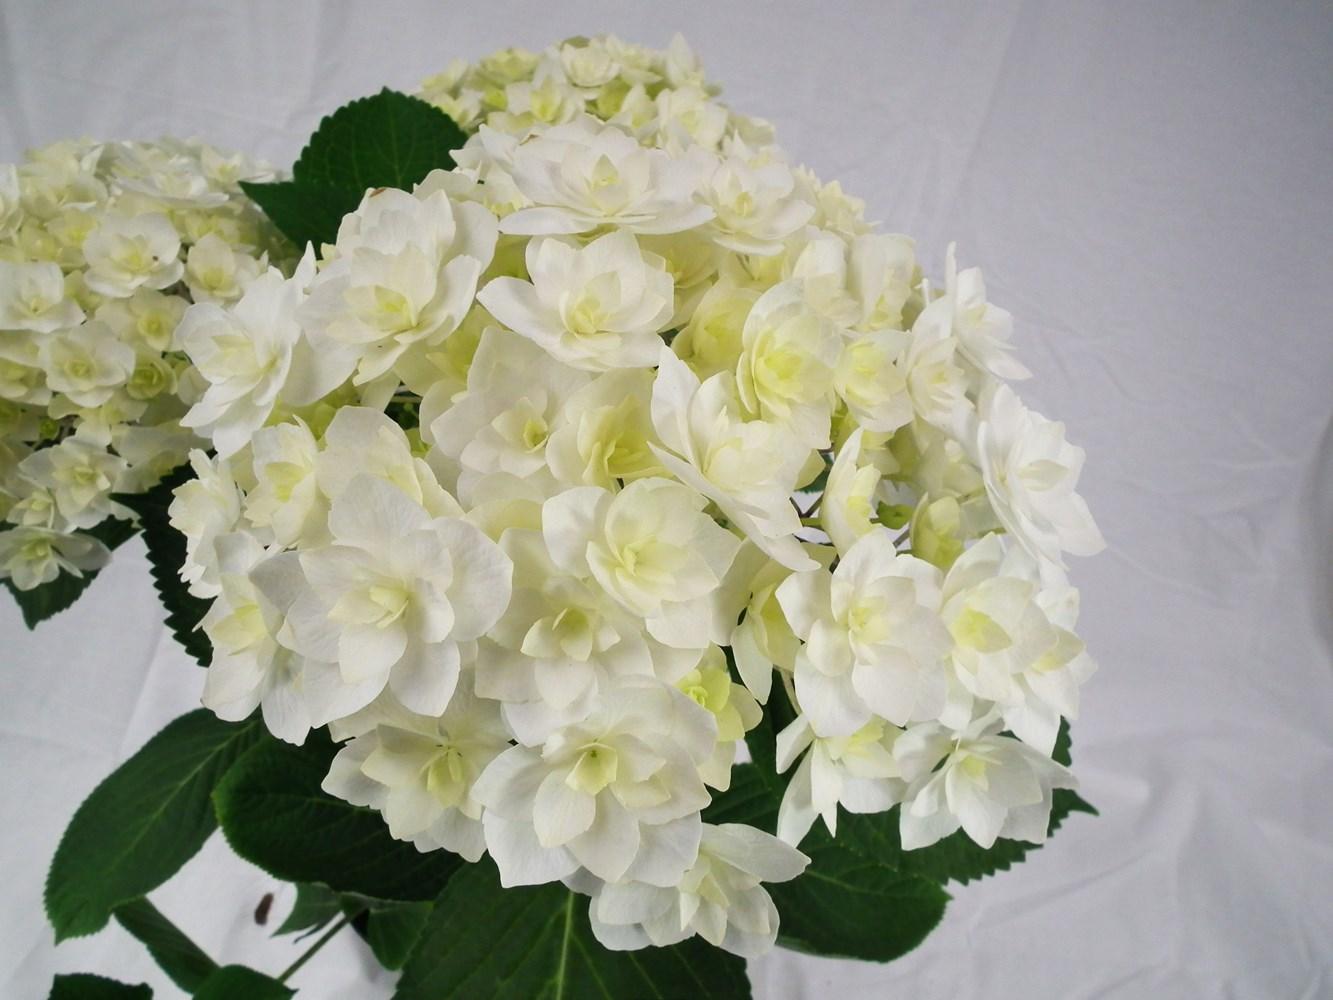 Website/Plants/2144398562/Images/Gallery/h_peace_01.0.jpg